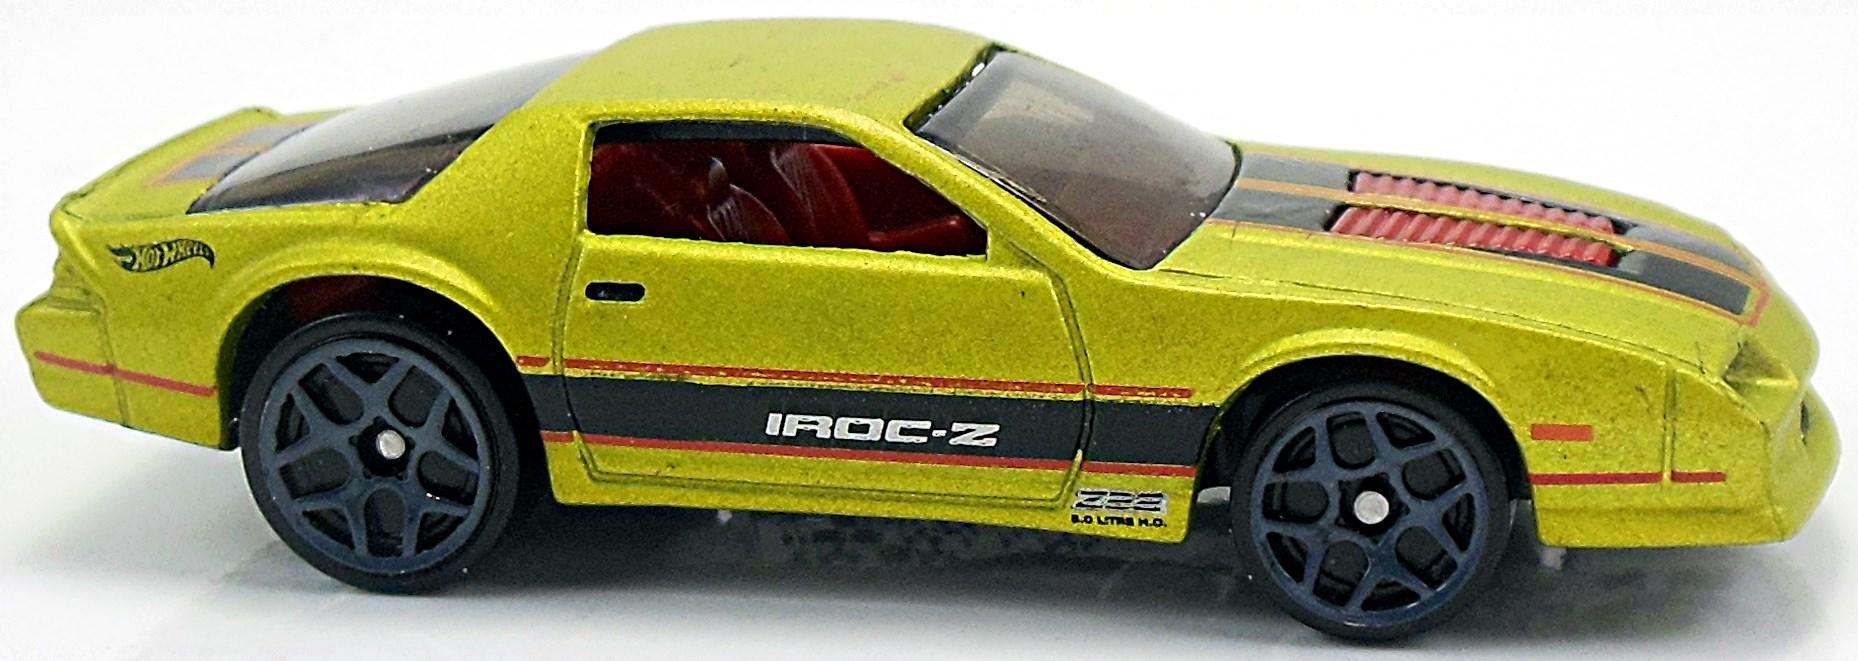 CP31 Hot Wheels Holiday Hot Rods 1985 Chevrolet Camaro Iroc-Z